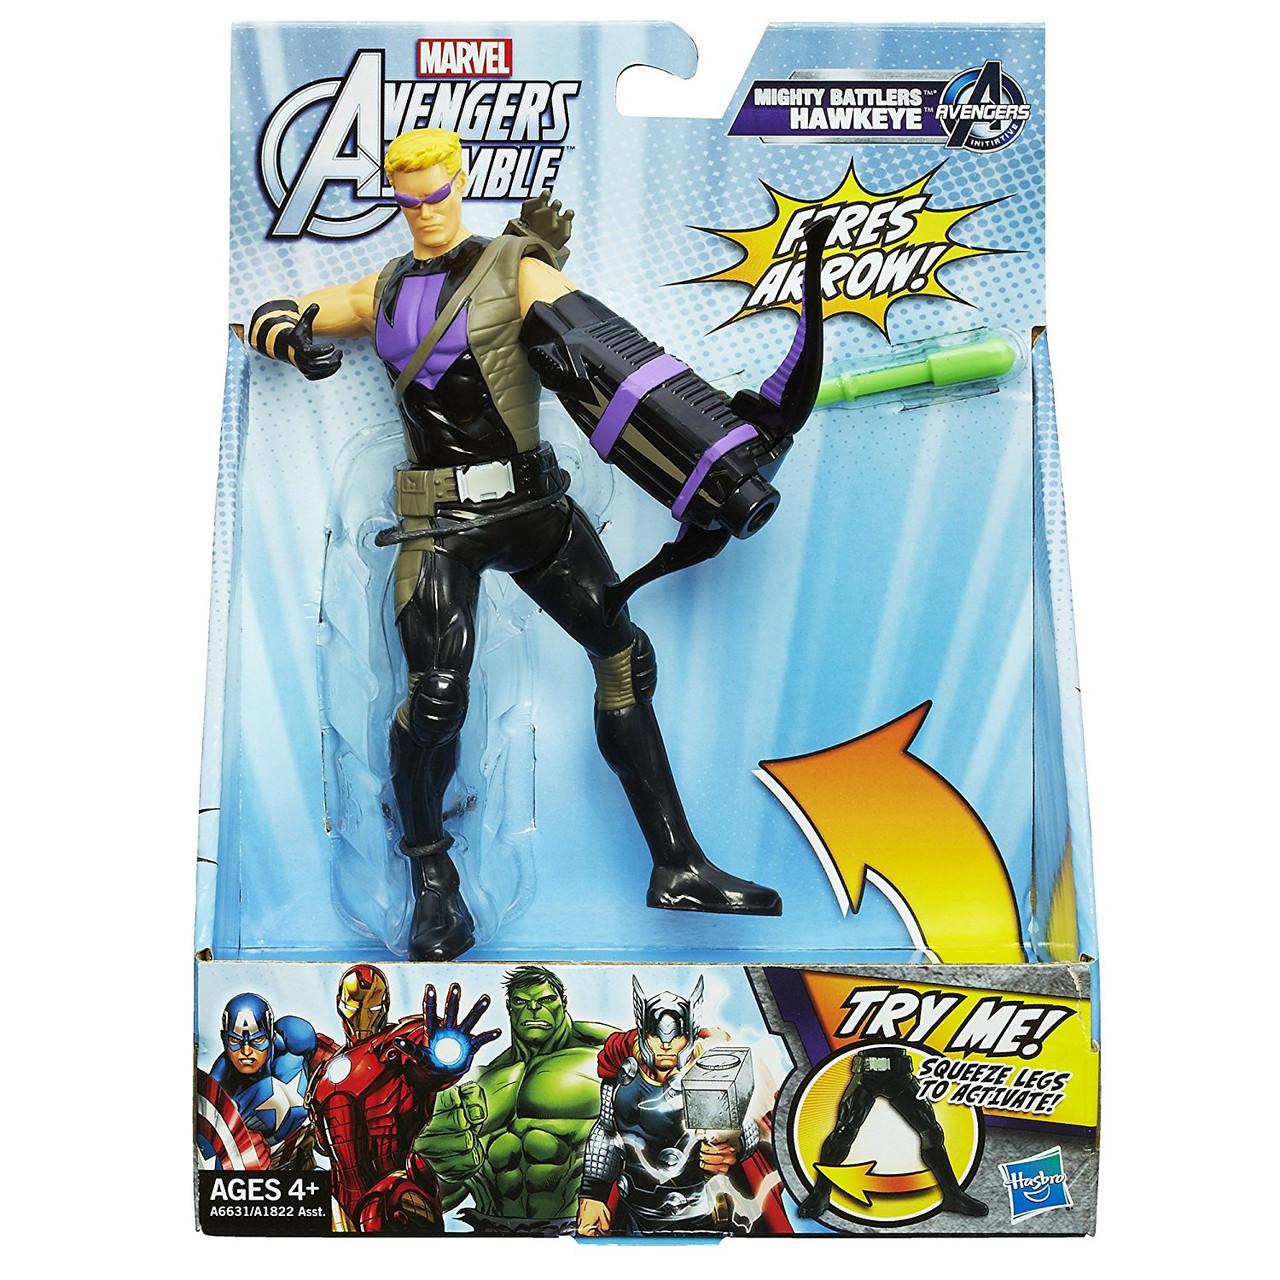 Стреляющая фигурка Соколиного Глаза с боевым оружием - Hawkeye, Avengers, Assemble, Squeeze Legs, Hasbro